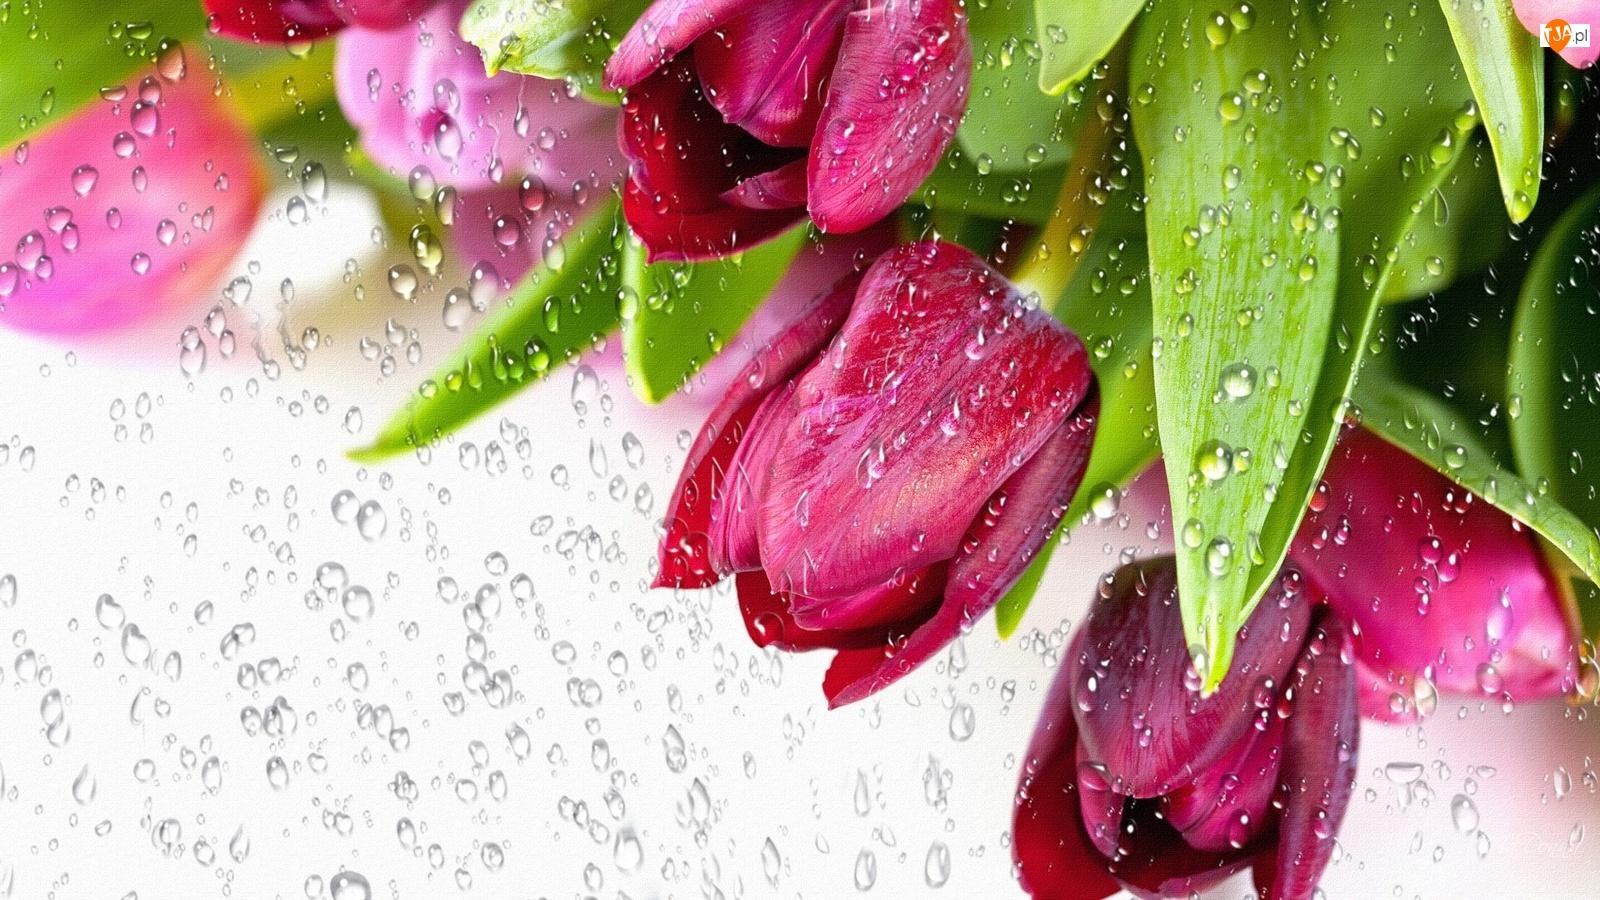 Deszczu, Tulipany, Krople